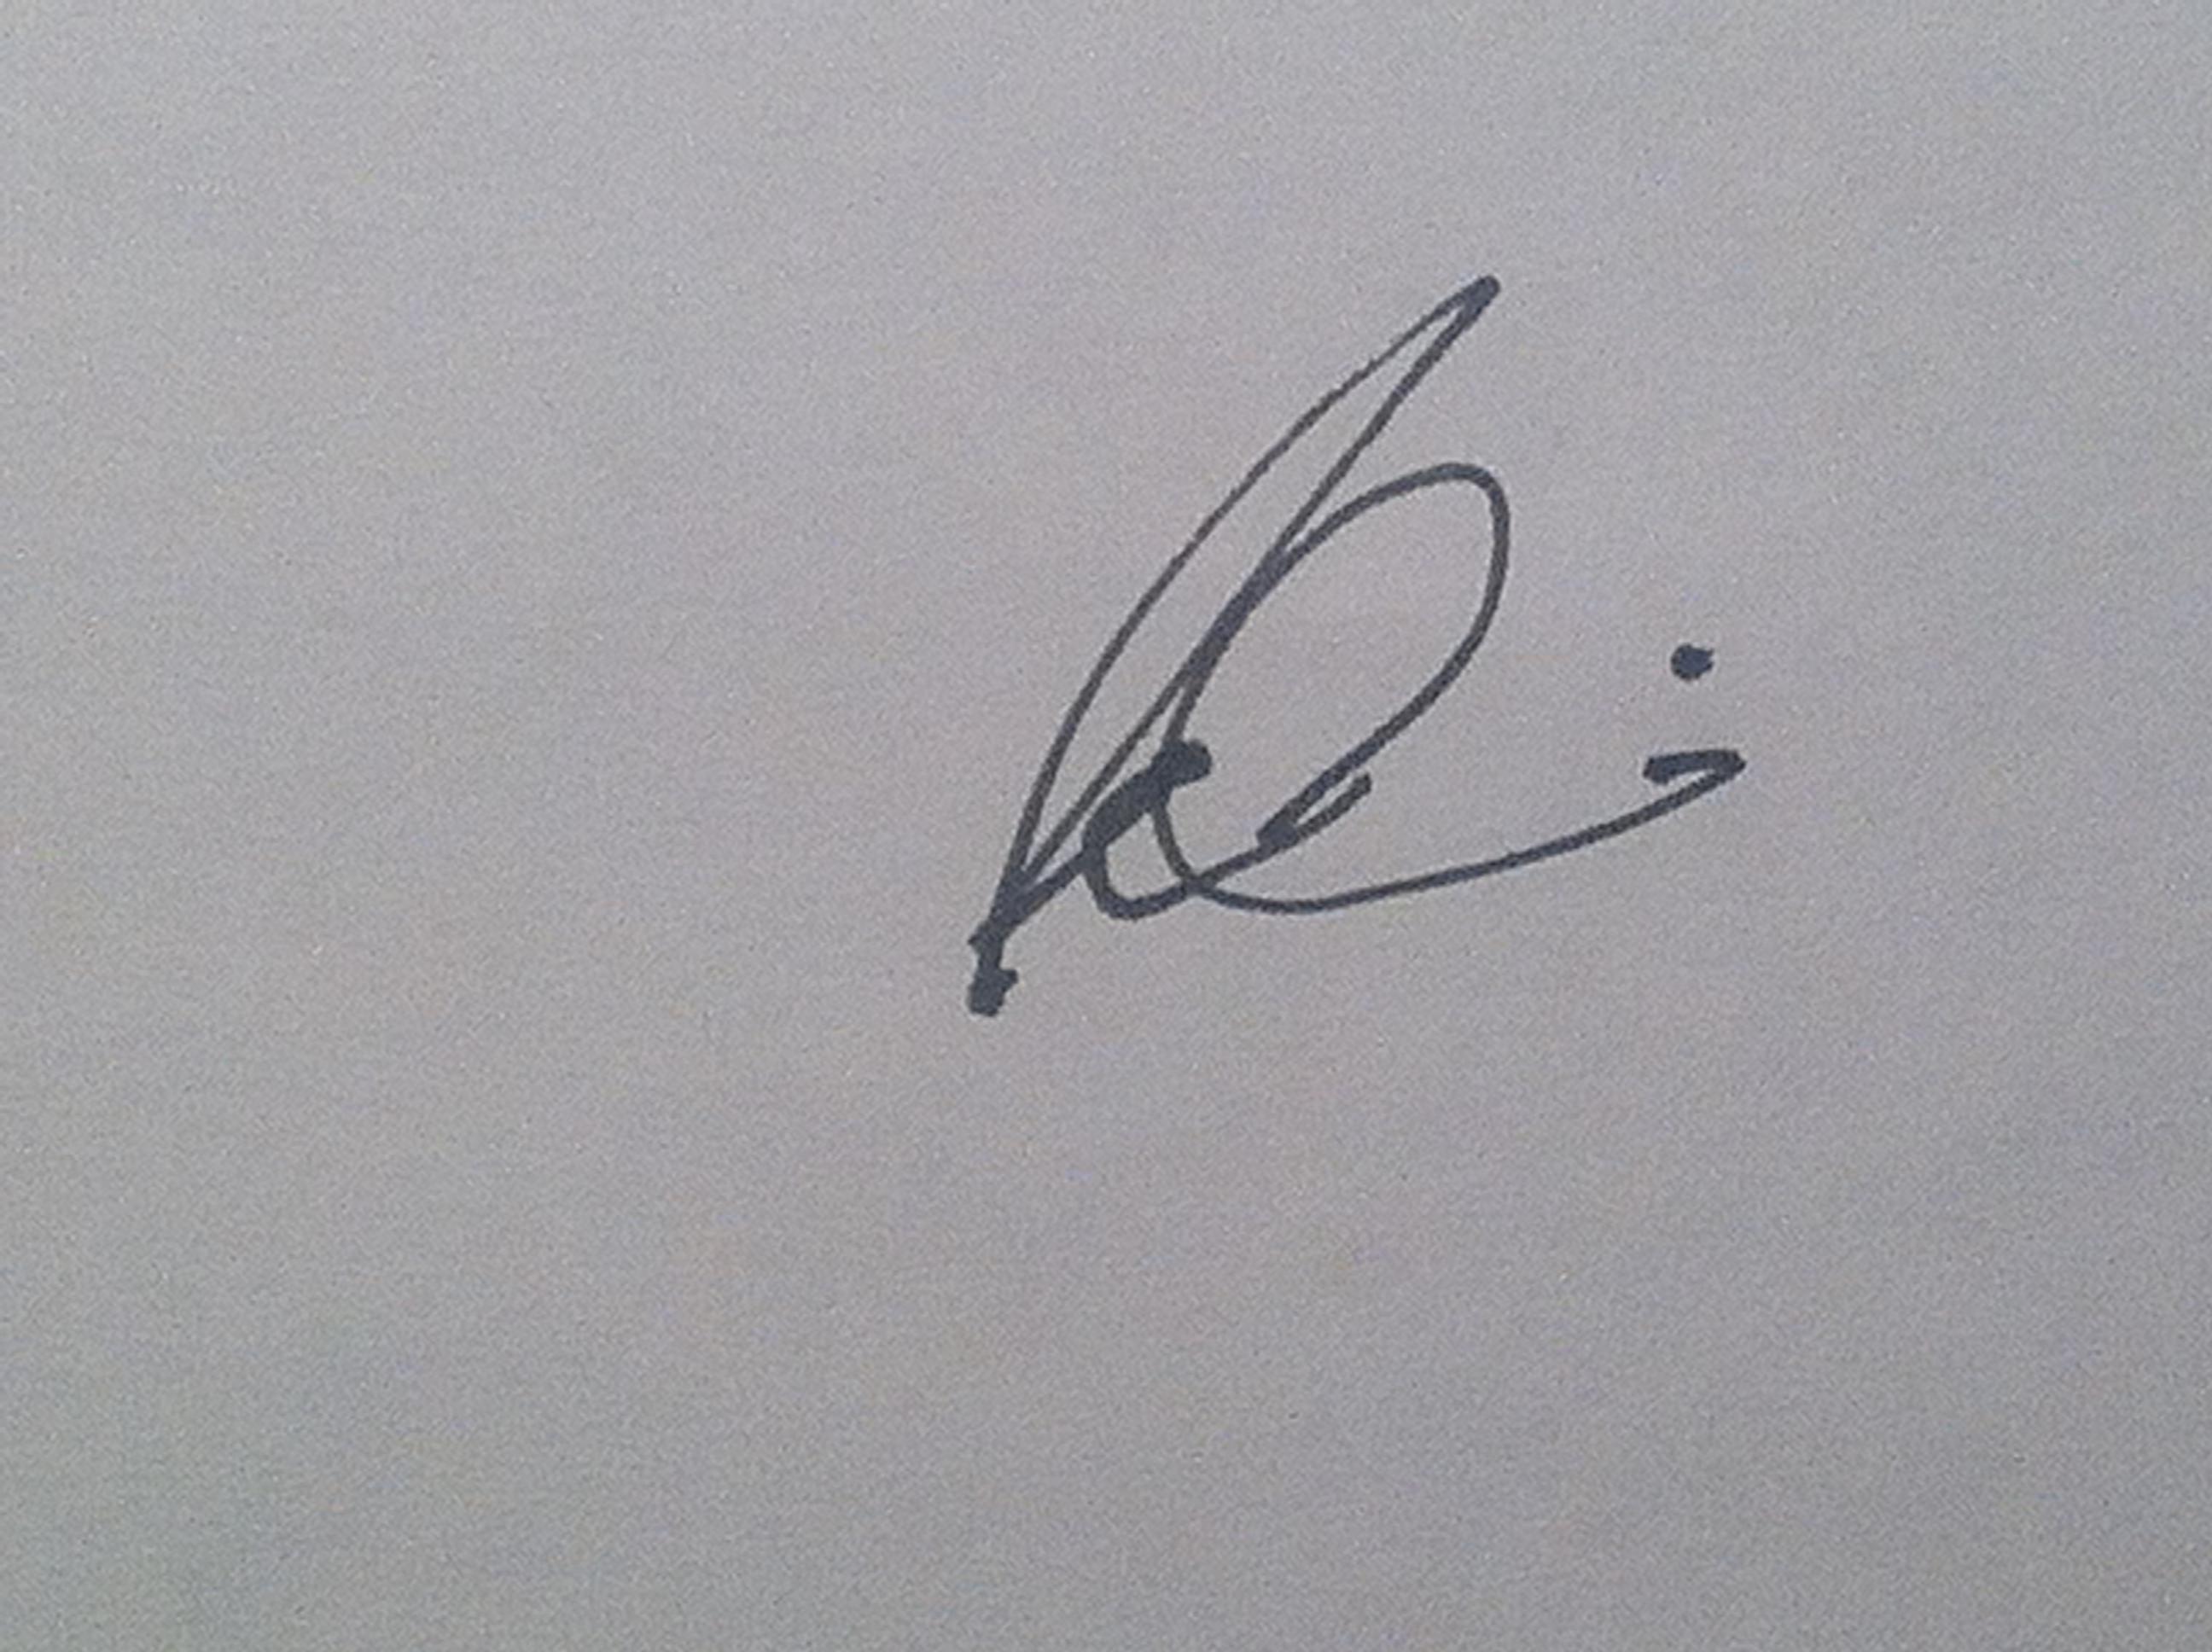 Elizabeth april                                                                                                                                                                              elizabeth  April Sadler's Signature